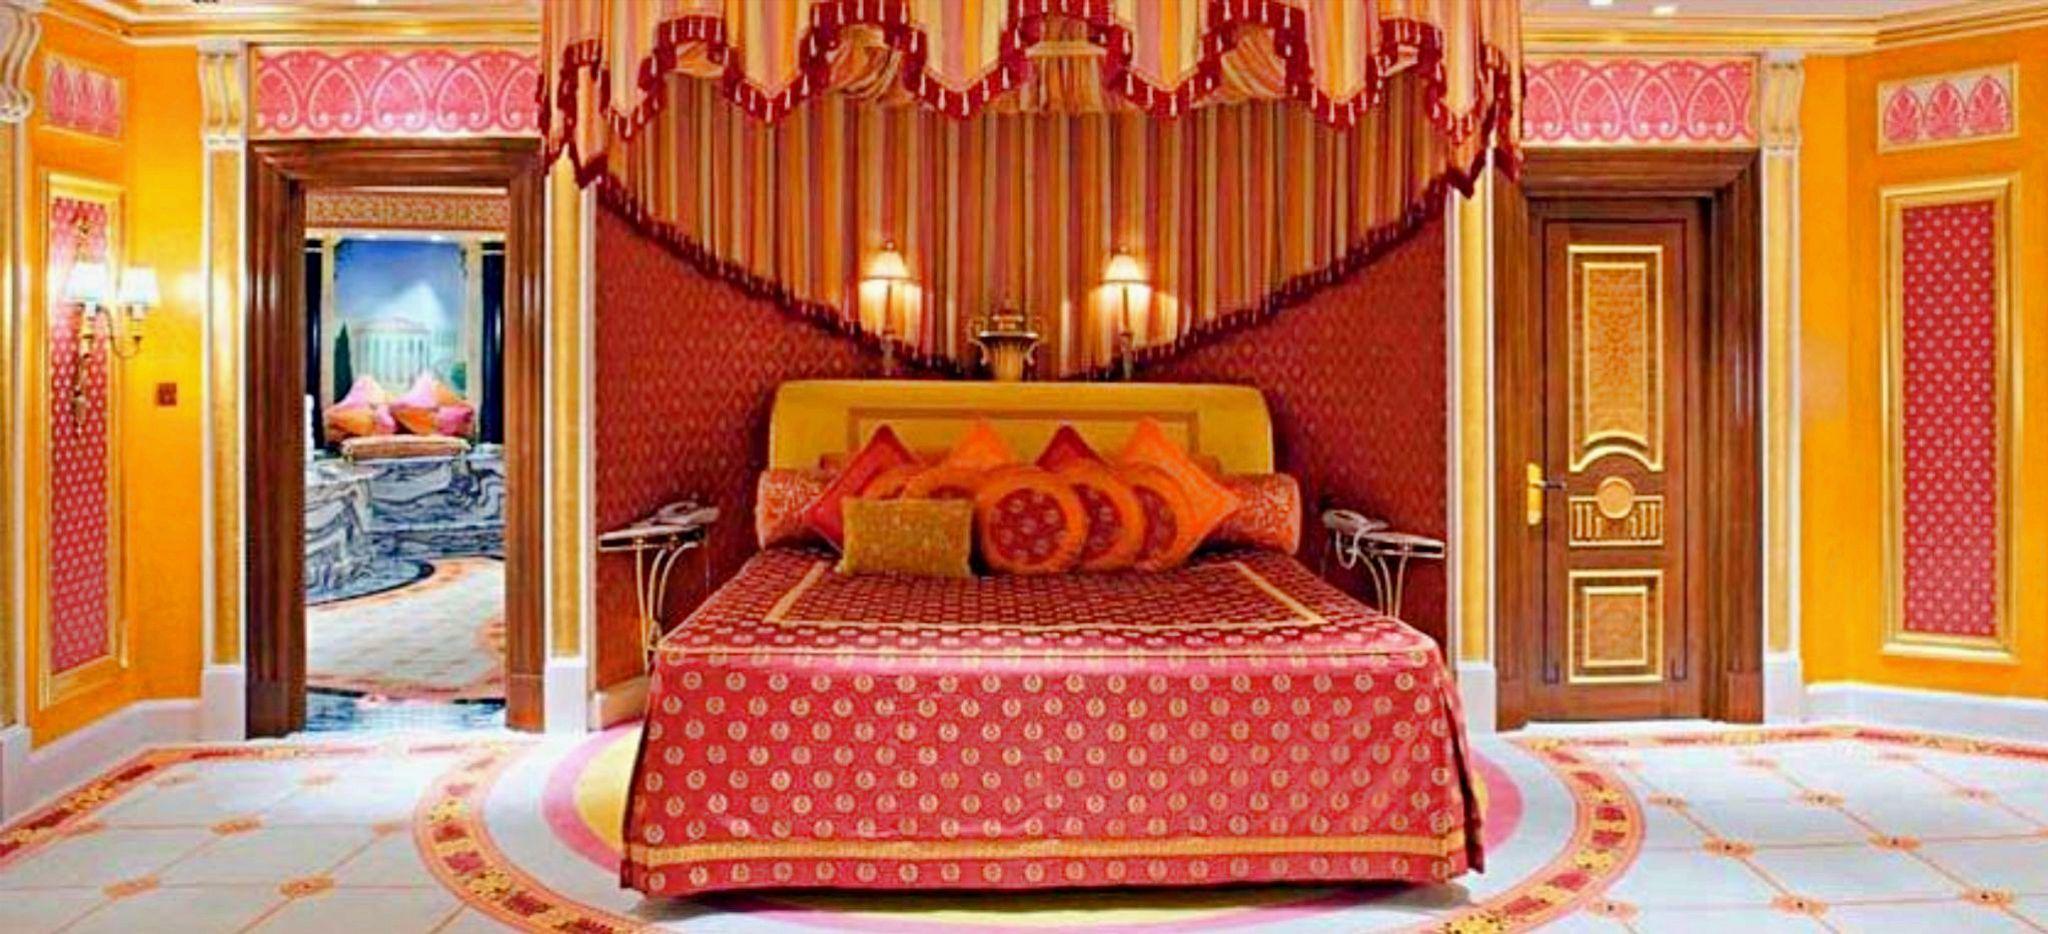 Schlafzimmer der Royal Suite im Hotel Burj al Arab